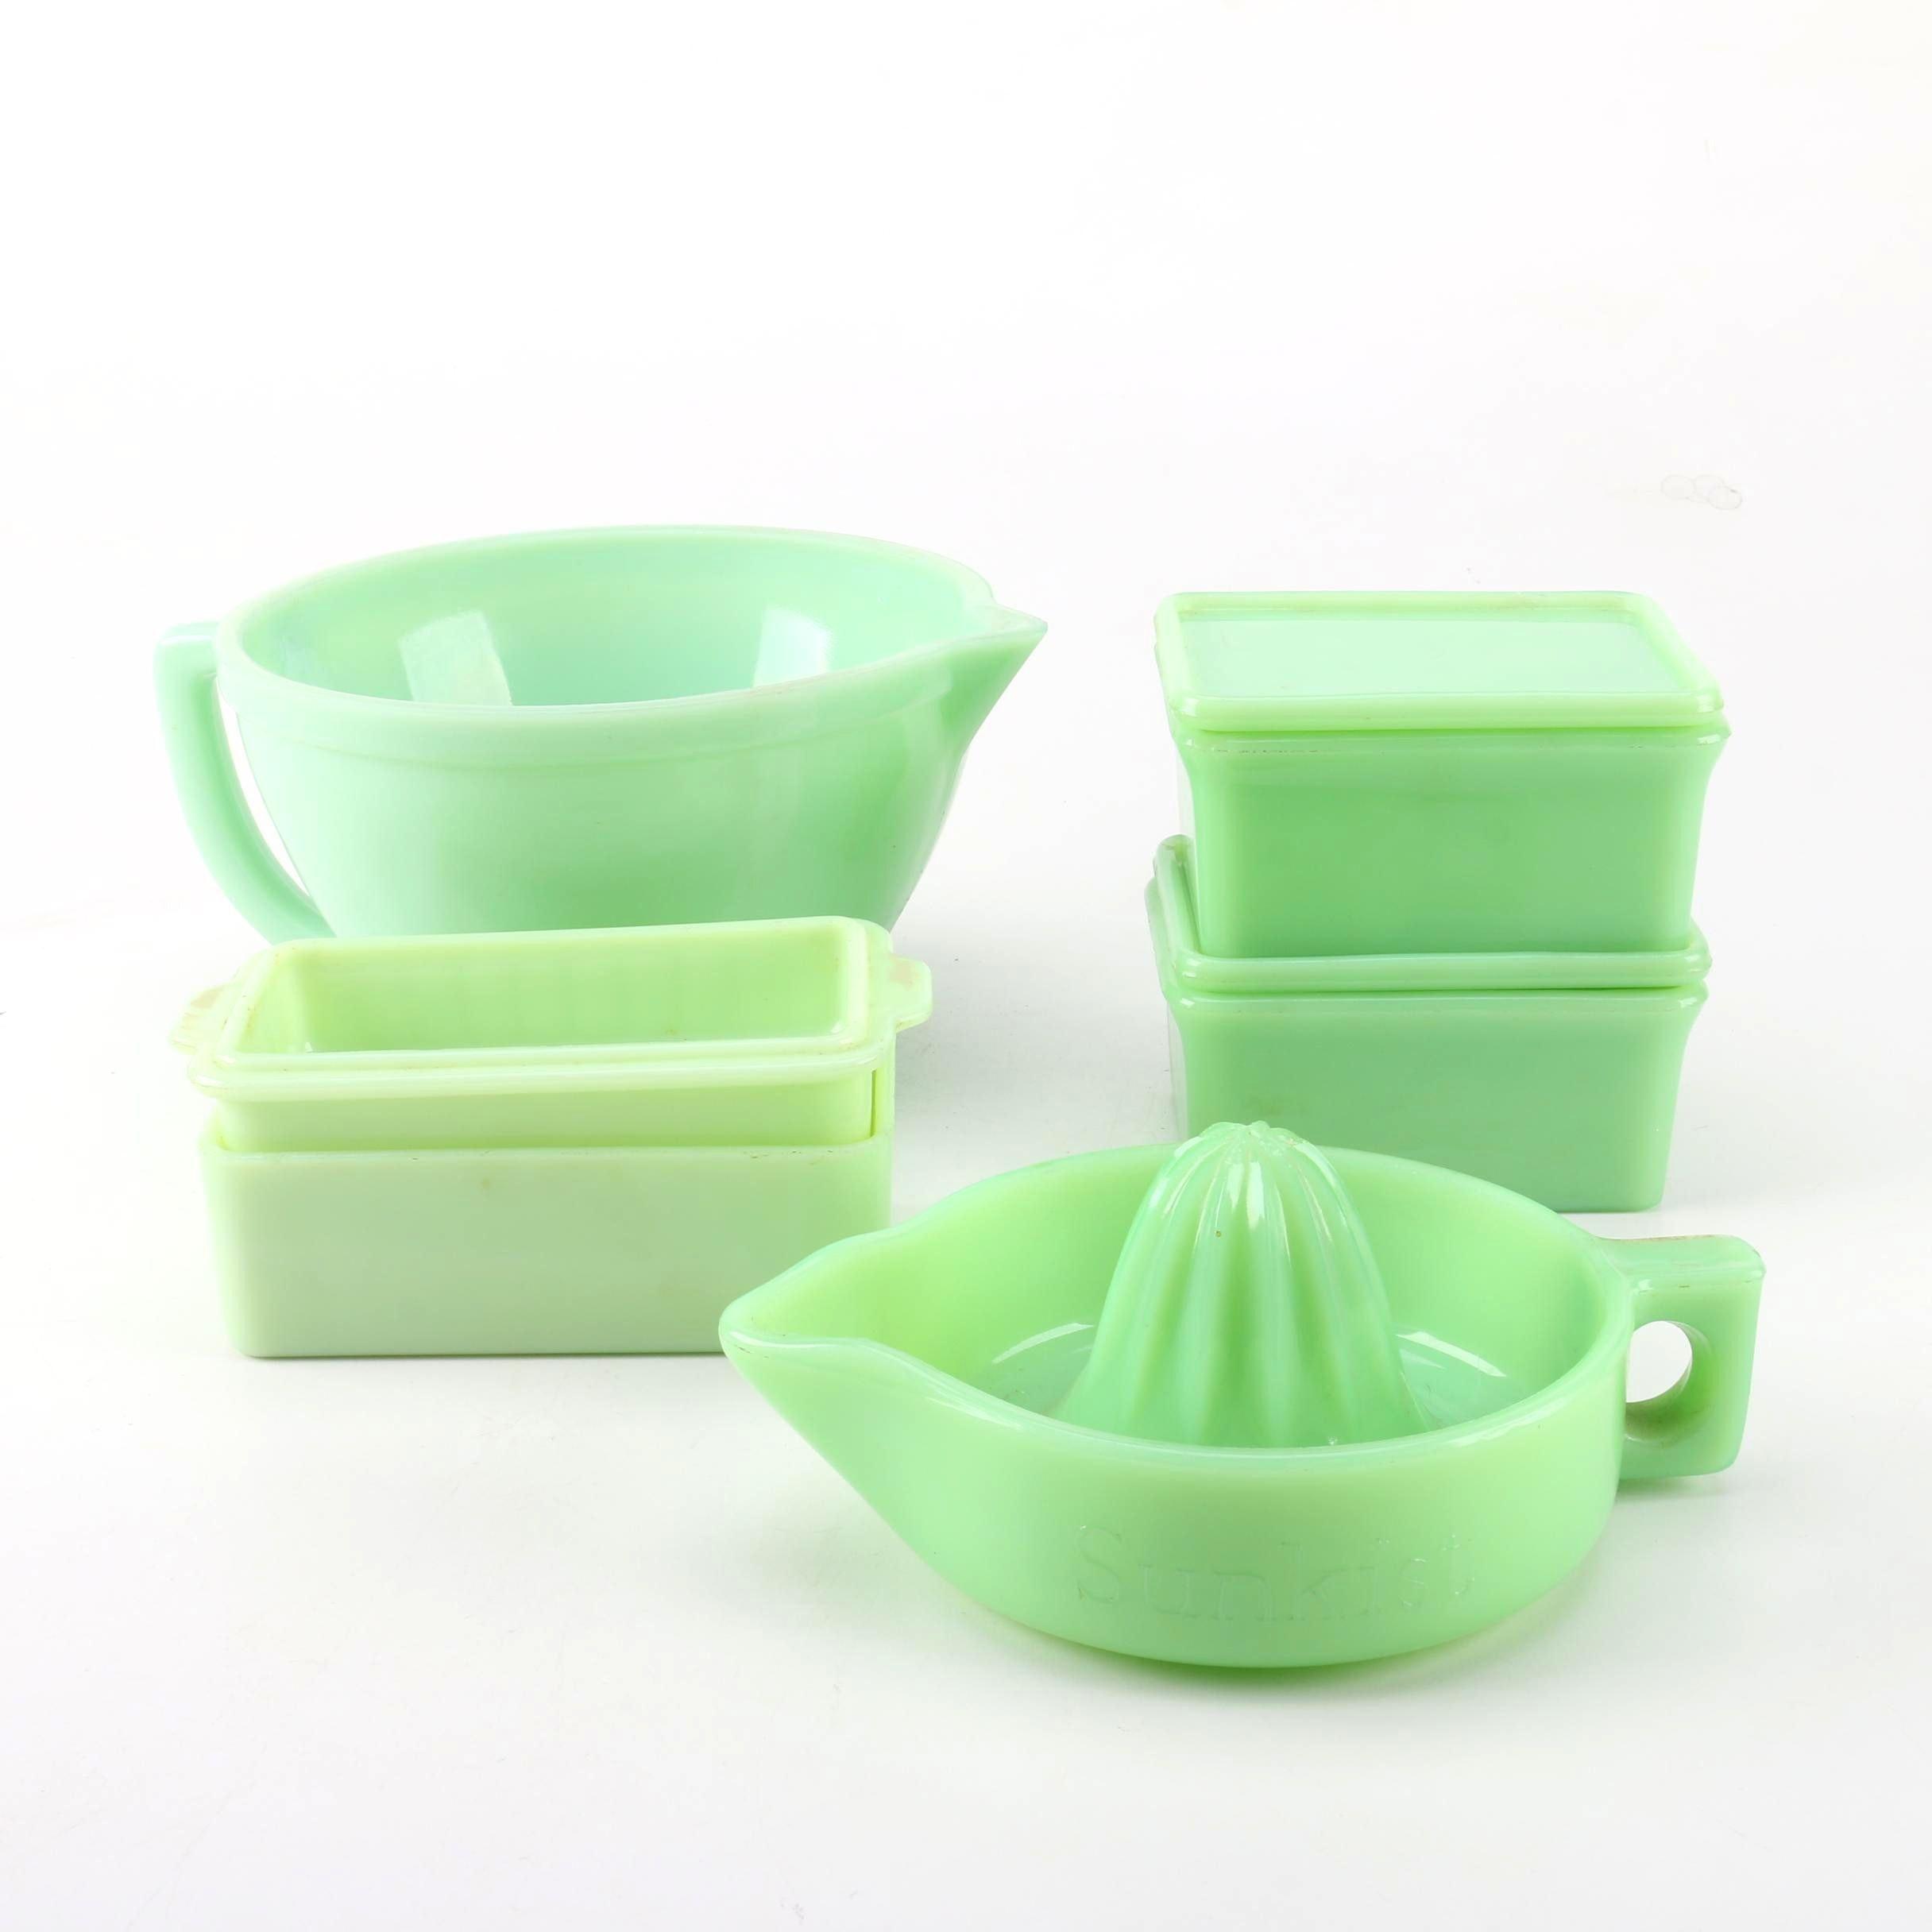 McKee Jadeite Lidded Refrigerator Bowls with Sunkist Juicer and More